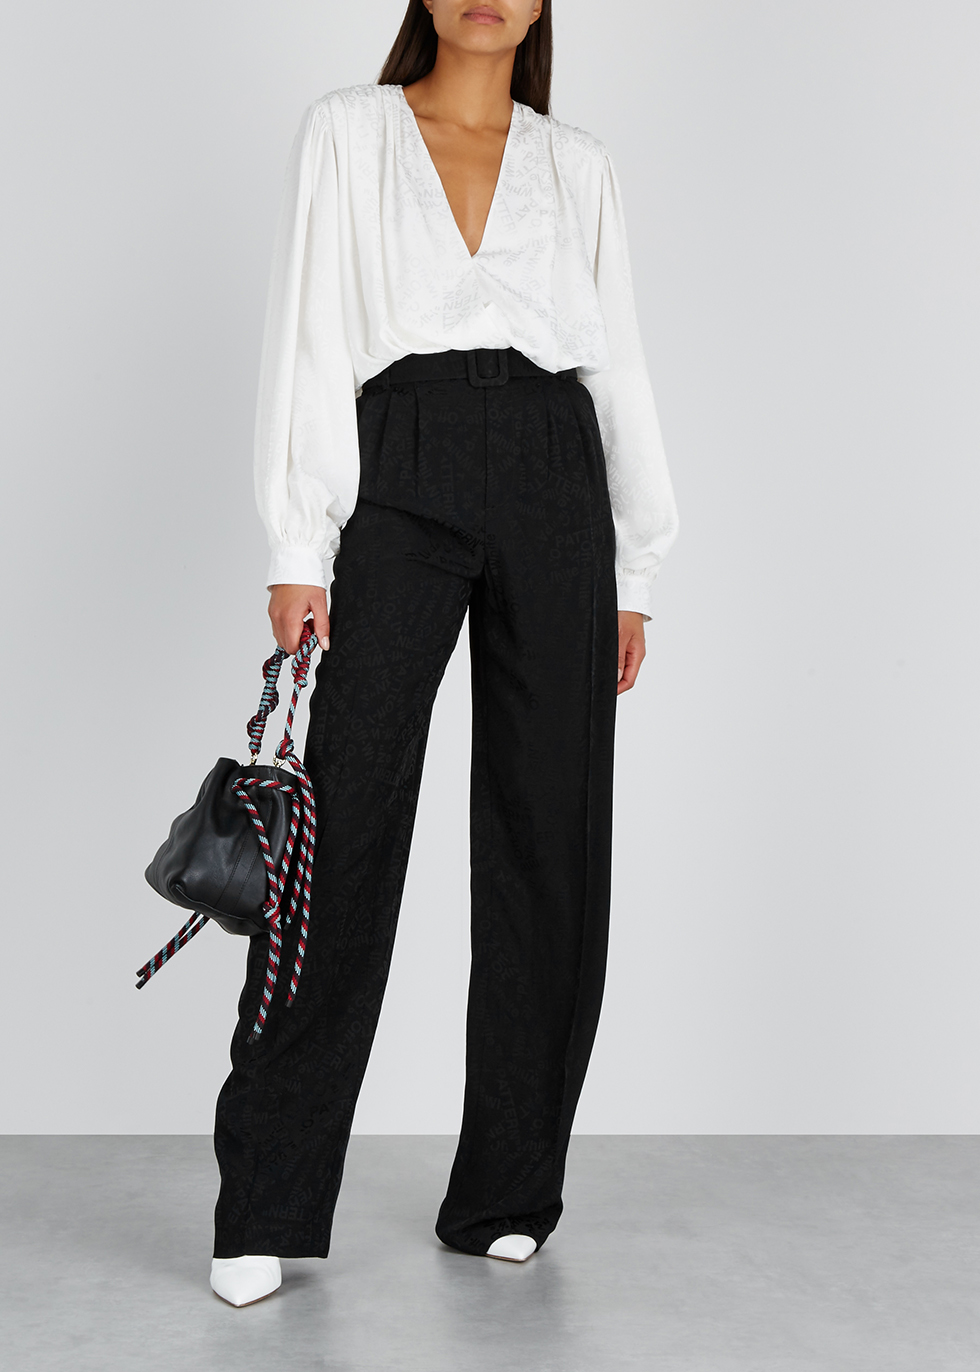 Black wide-leg jacquard trousers - Off-White